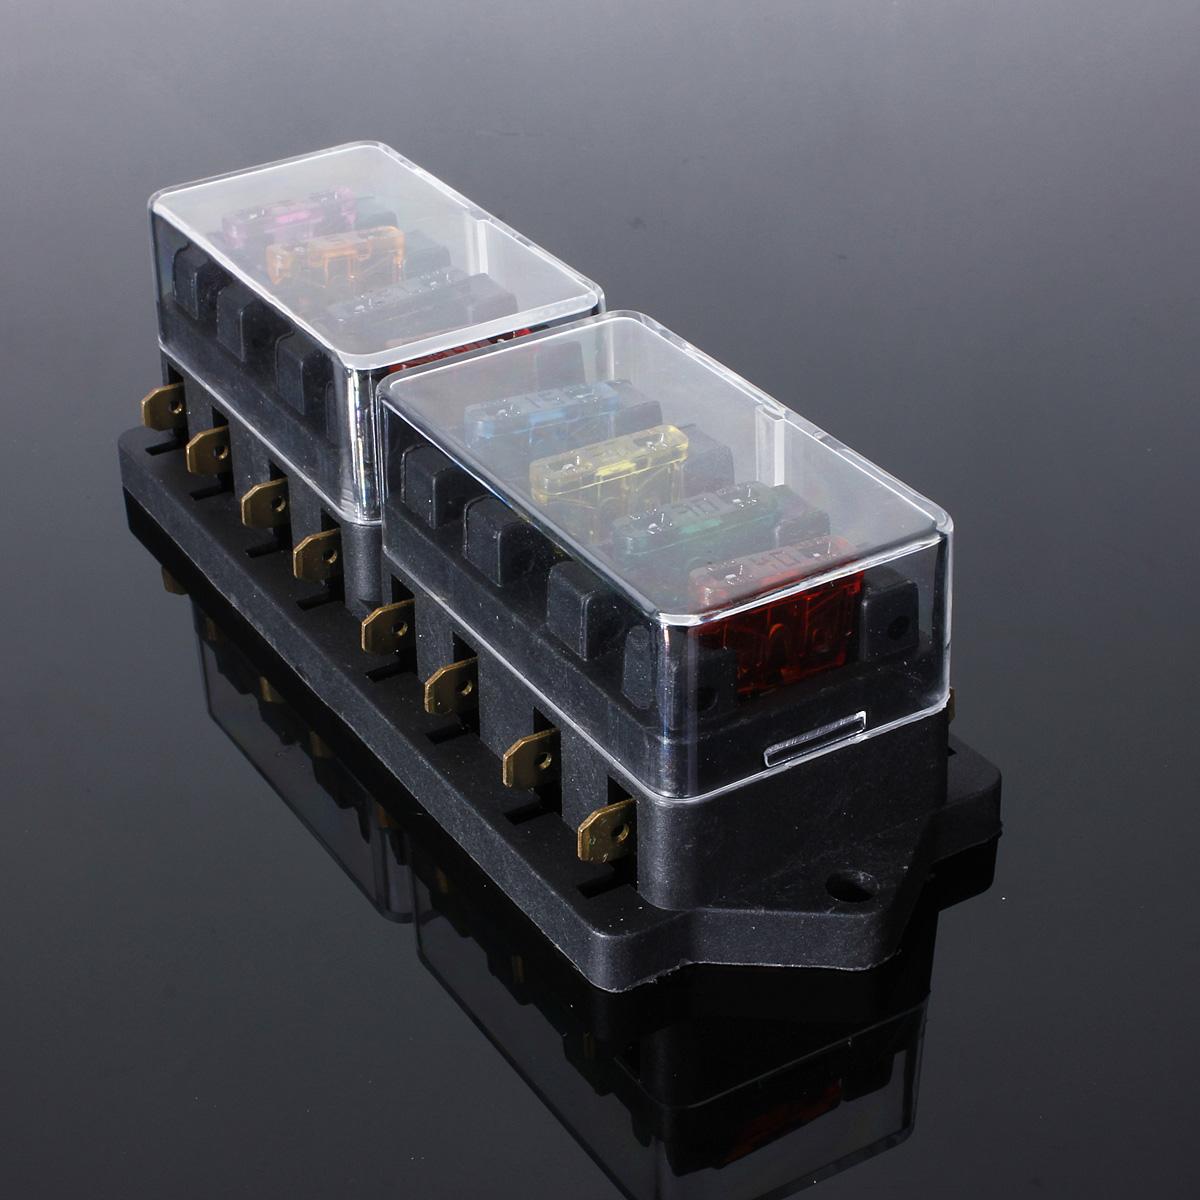 fuse holder box block 8 way car vehicle circuit automotive ... box car vehicle automotive blade fuse holder block 150 amp fuse holder box